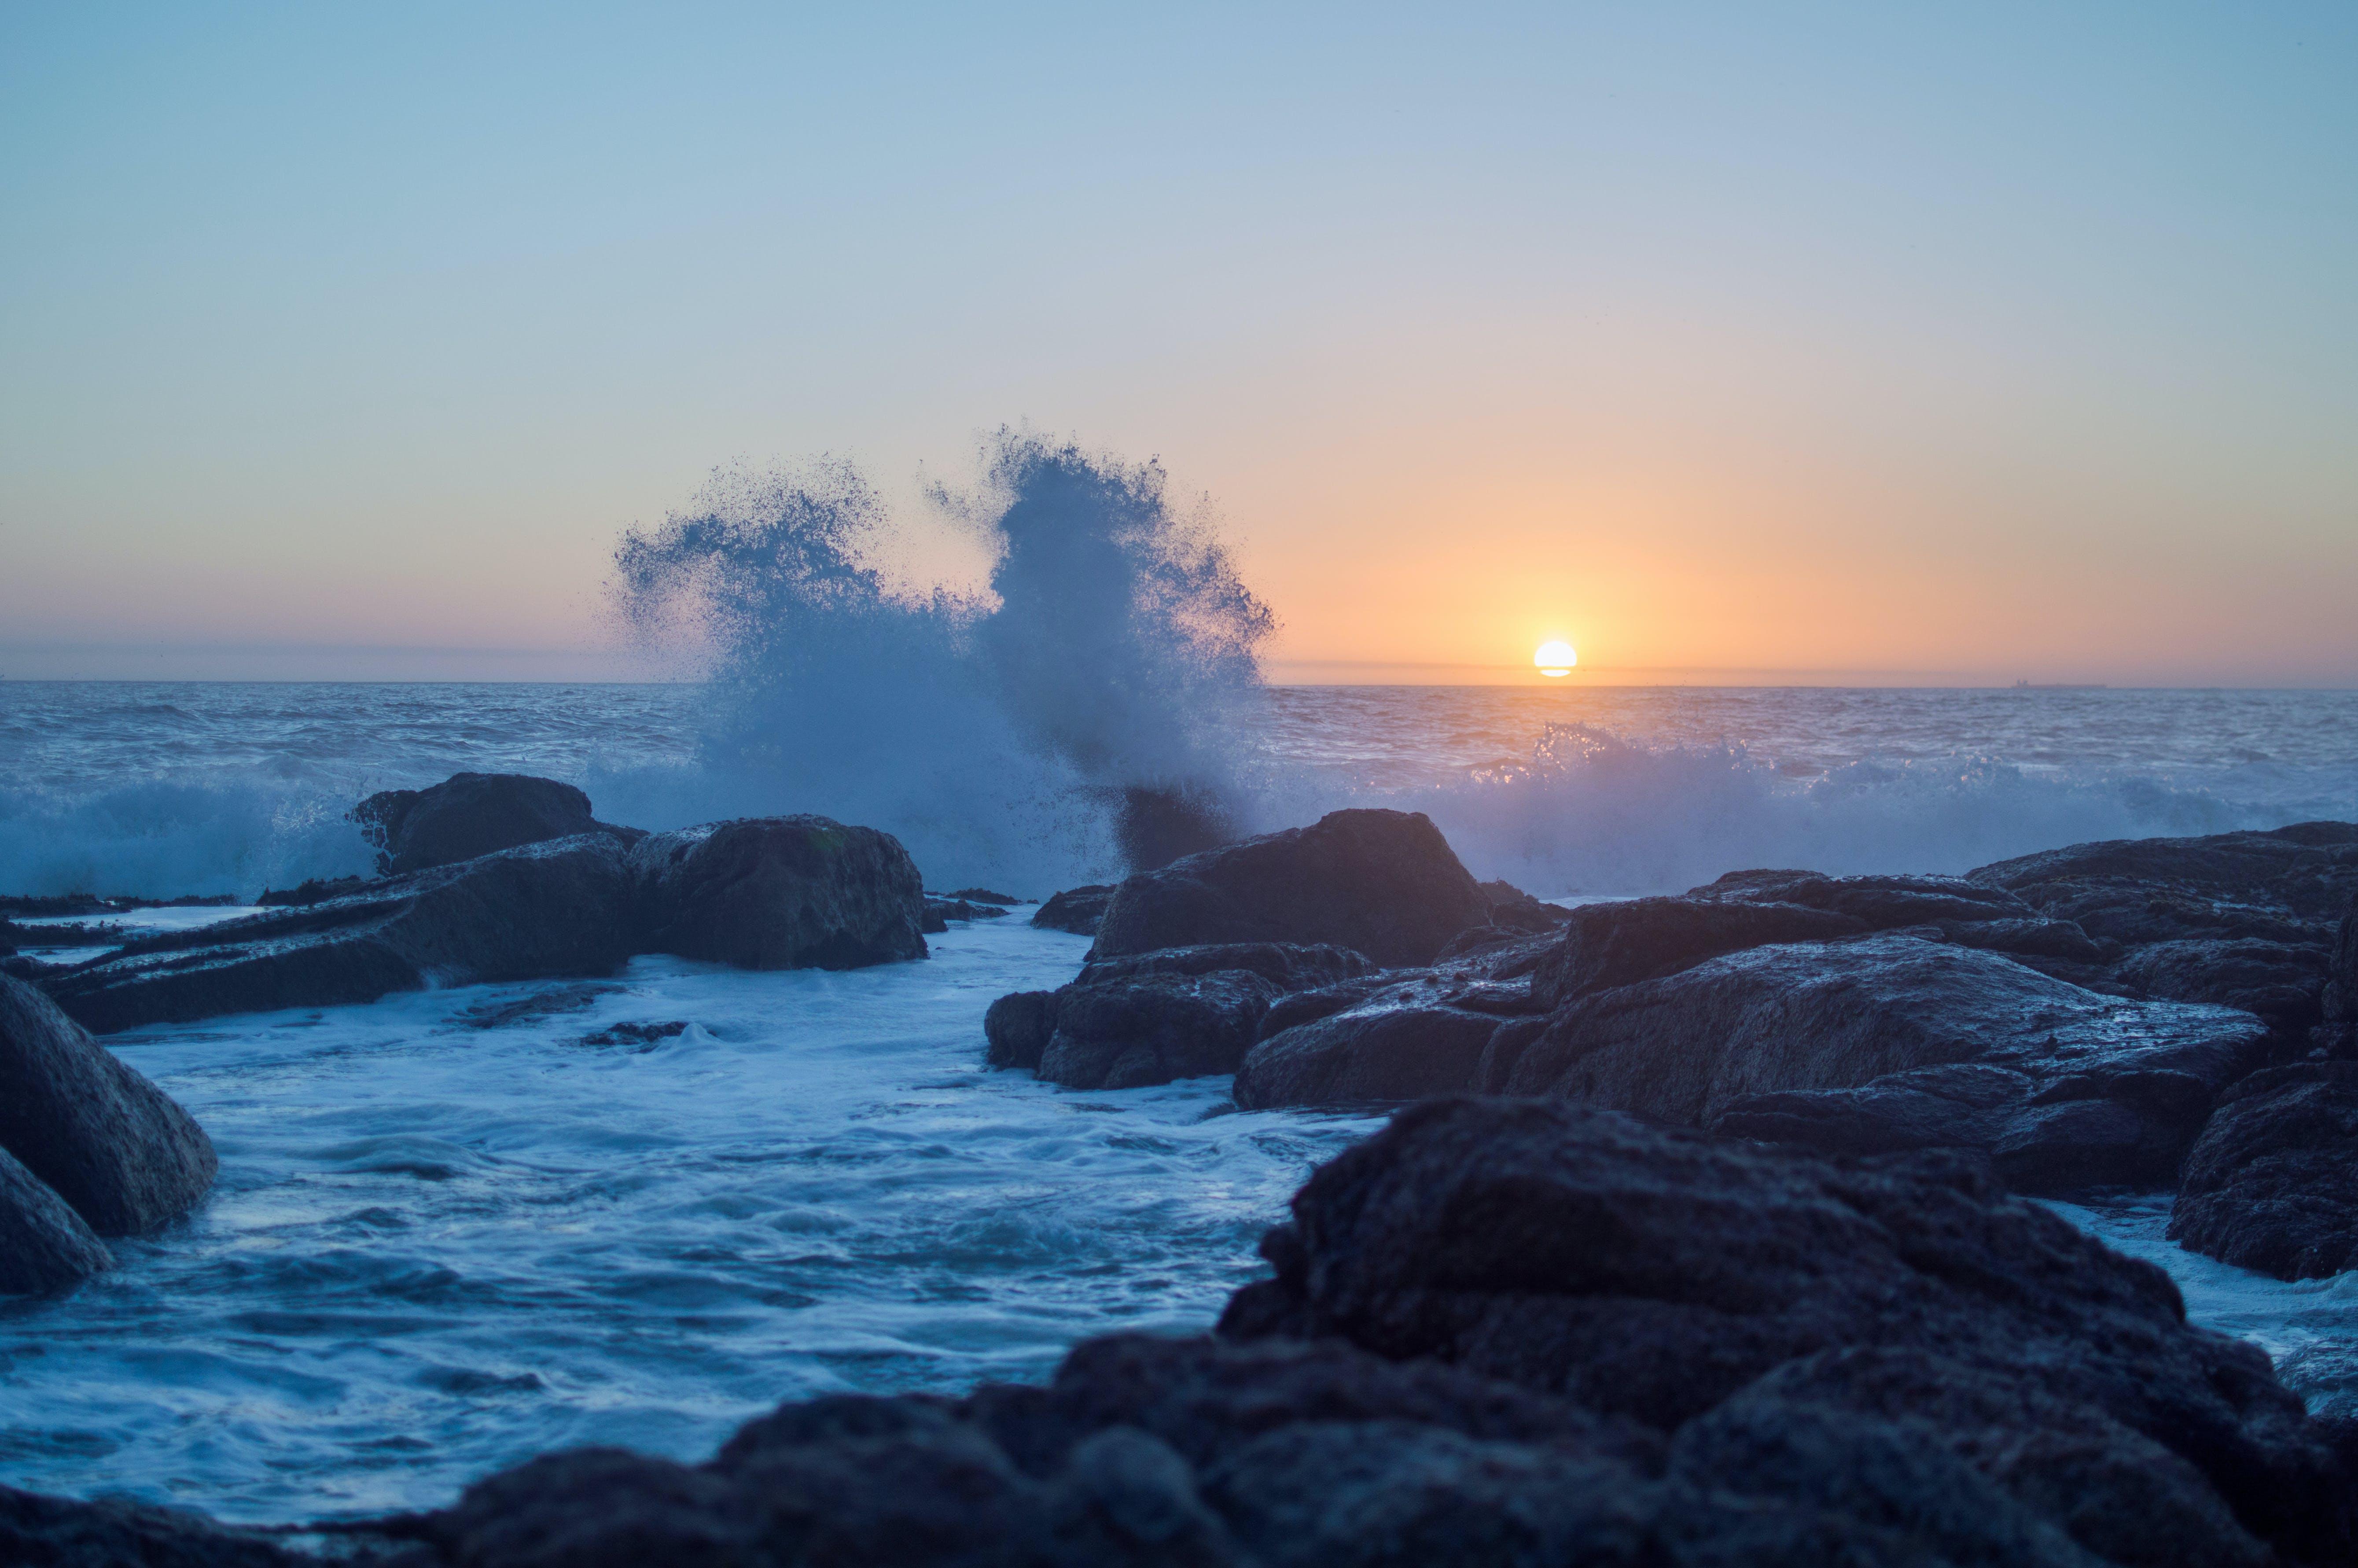 Kostnadsfri bild av 4k tapeter, fredlig, gryning, hav